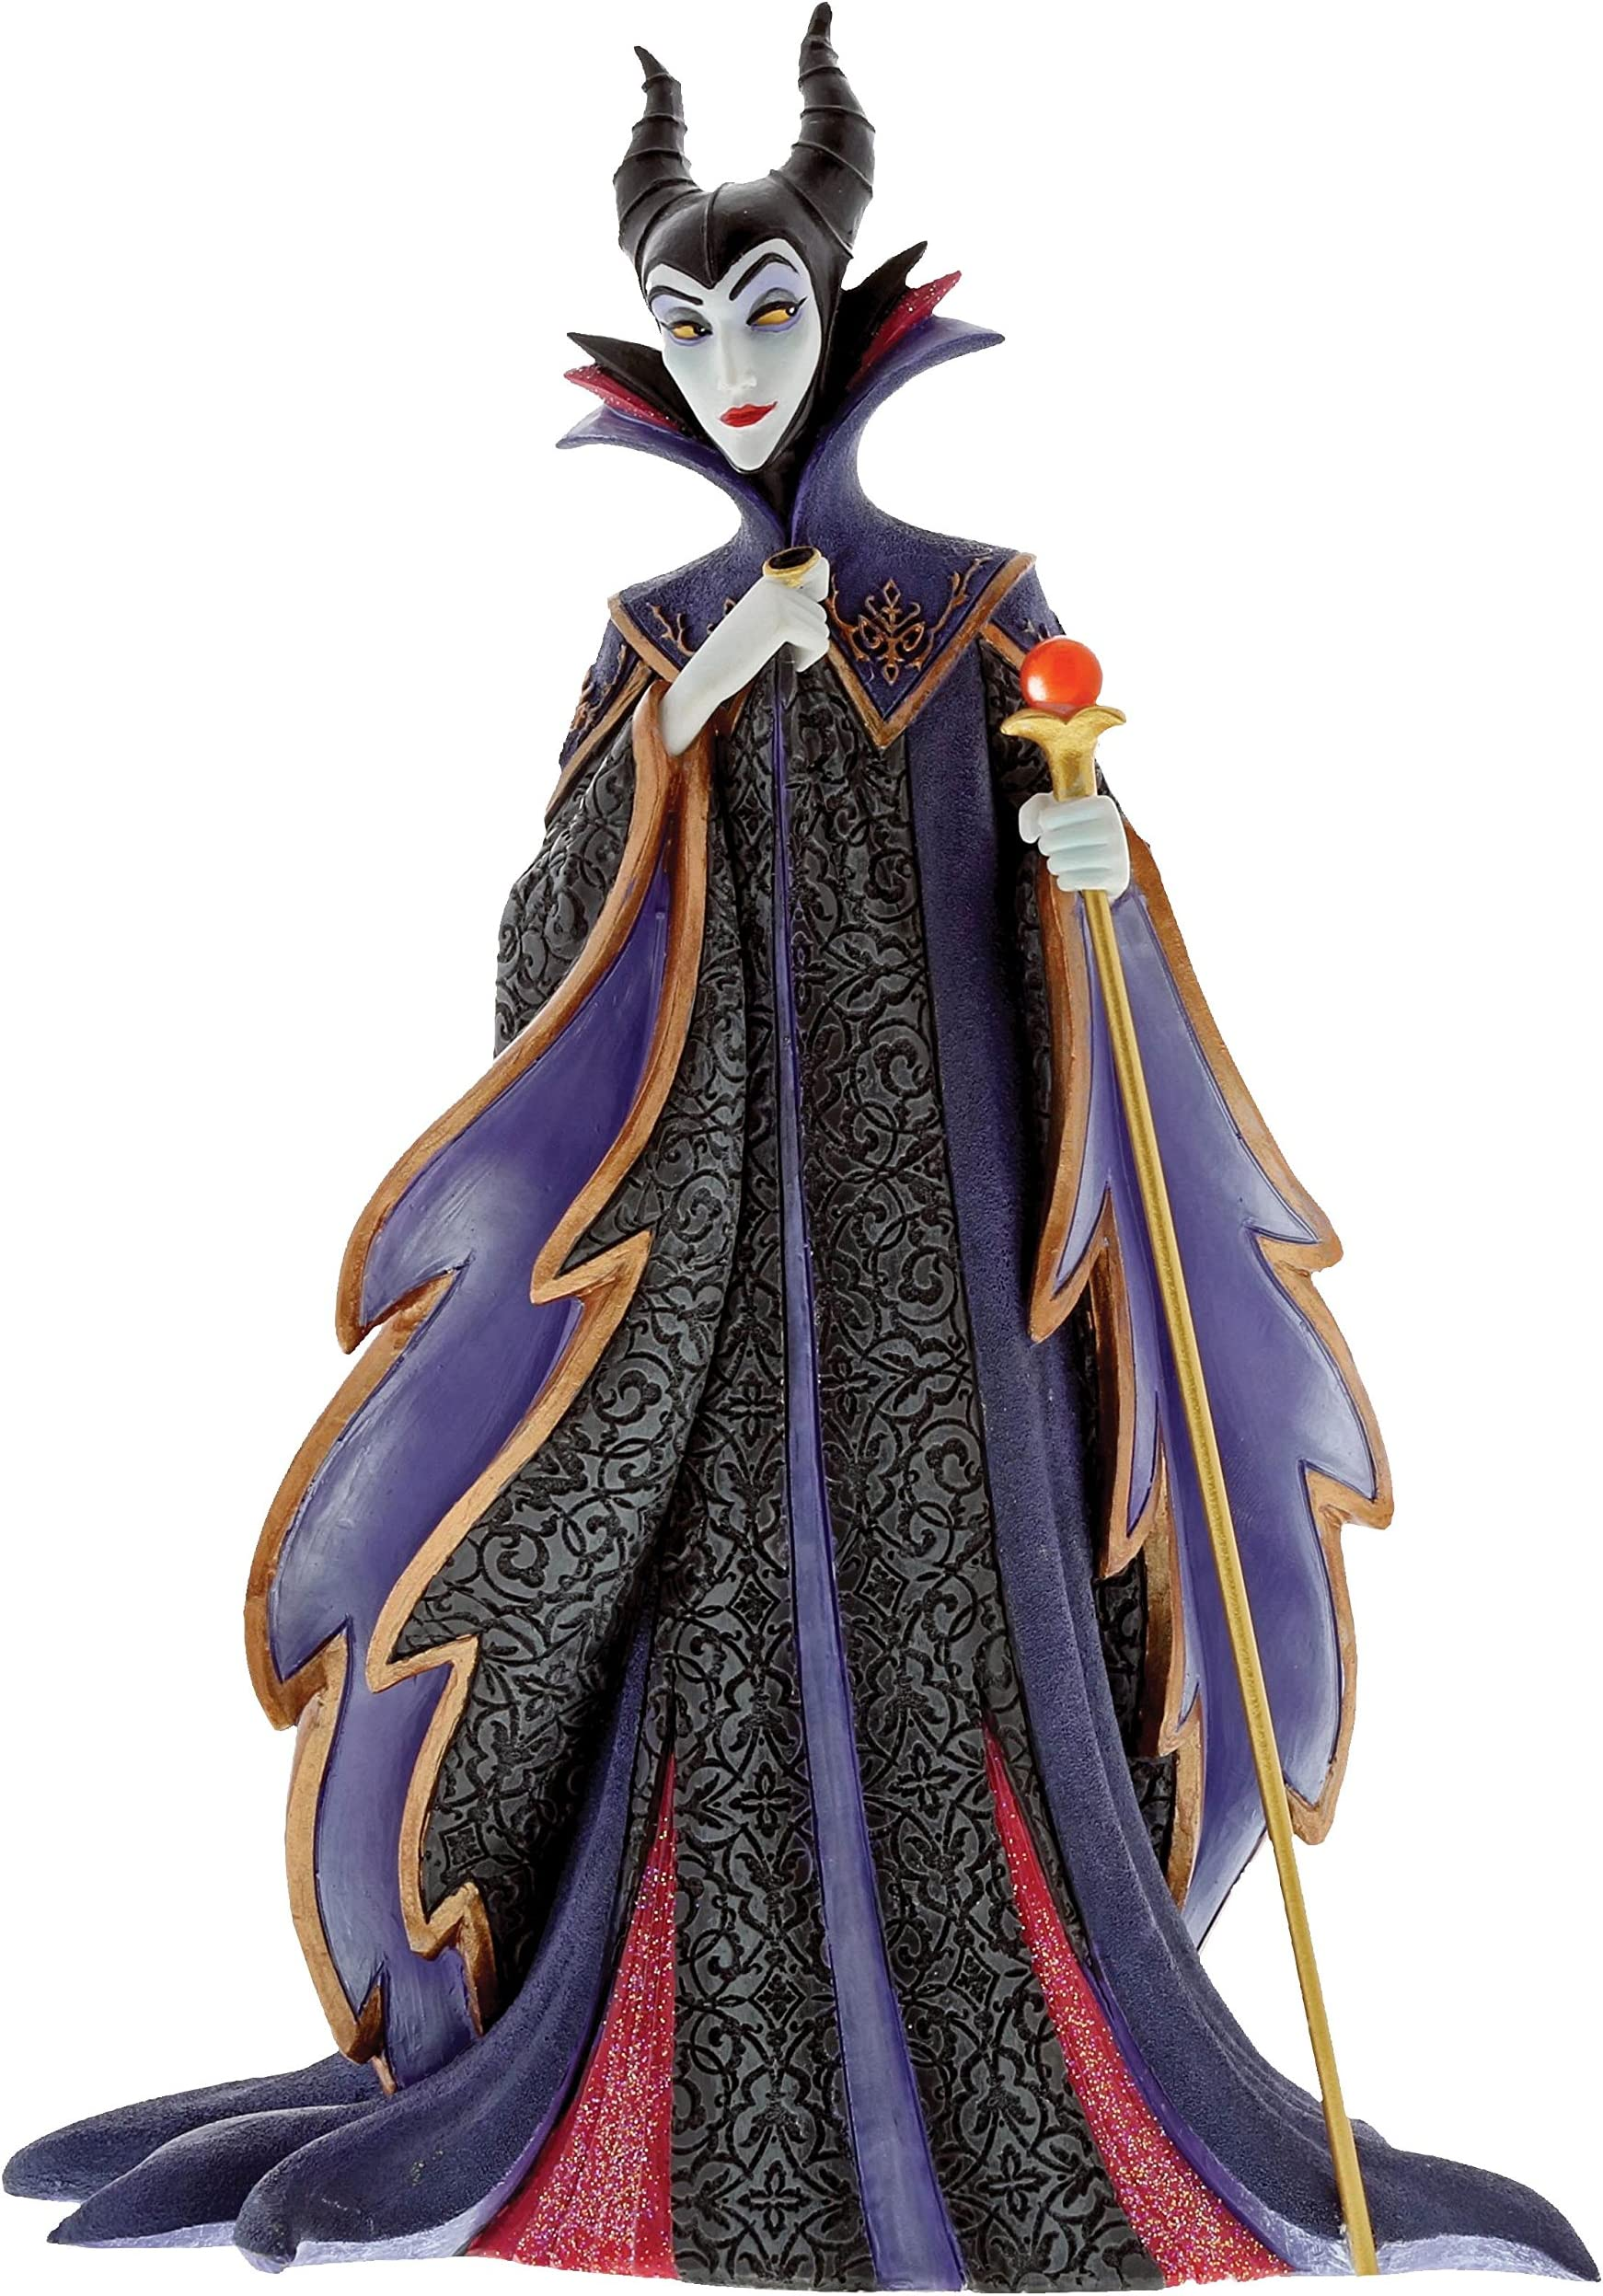 Disney castle \u2013 Maleficent\u2019s castle from Sleeping Beauty animated movie handmade scrapbook embellishment